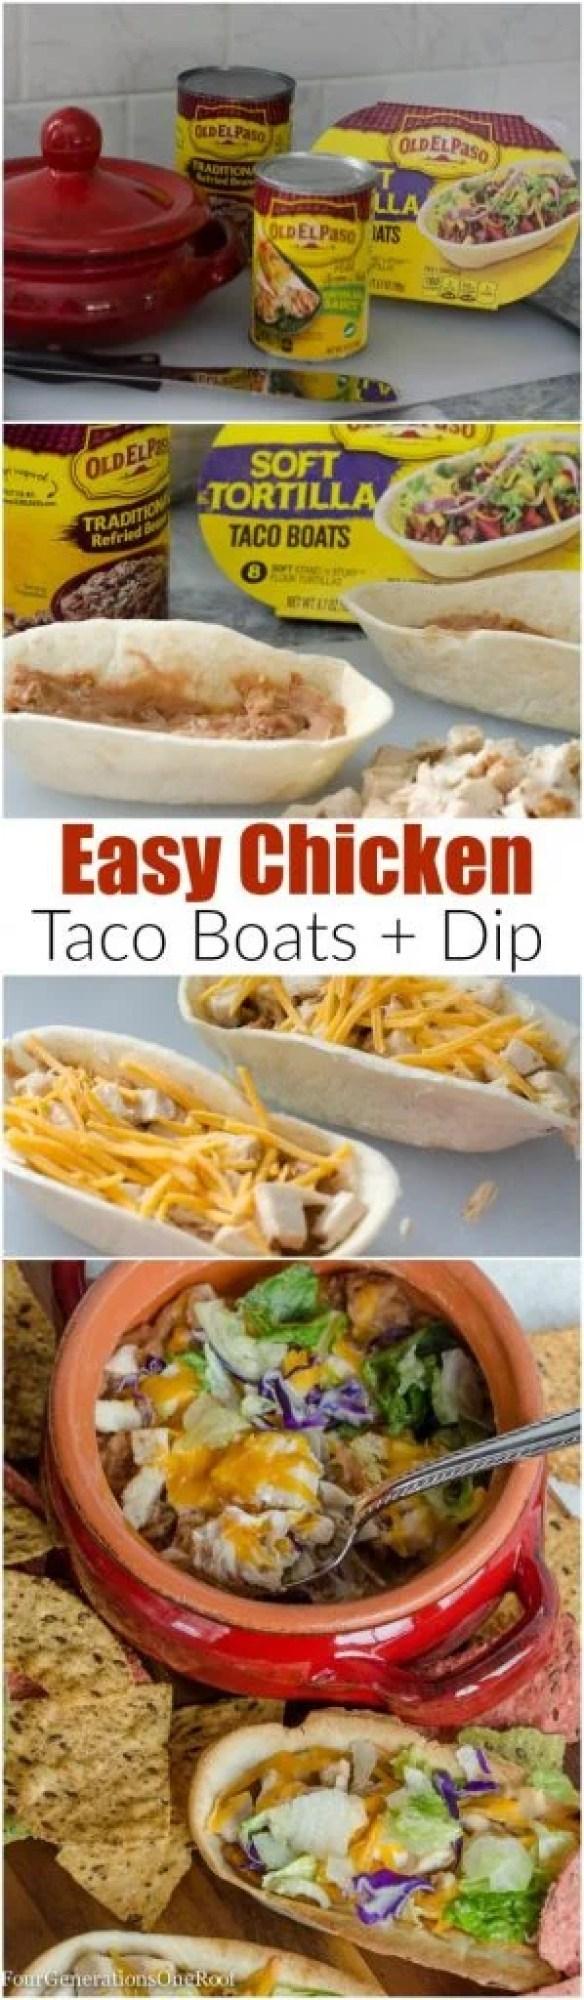 Mexican Chicken Taco Boats dip